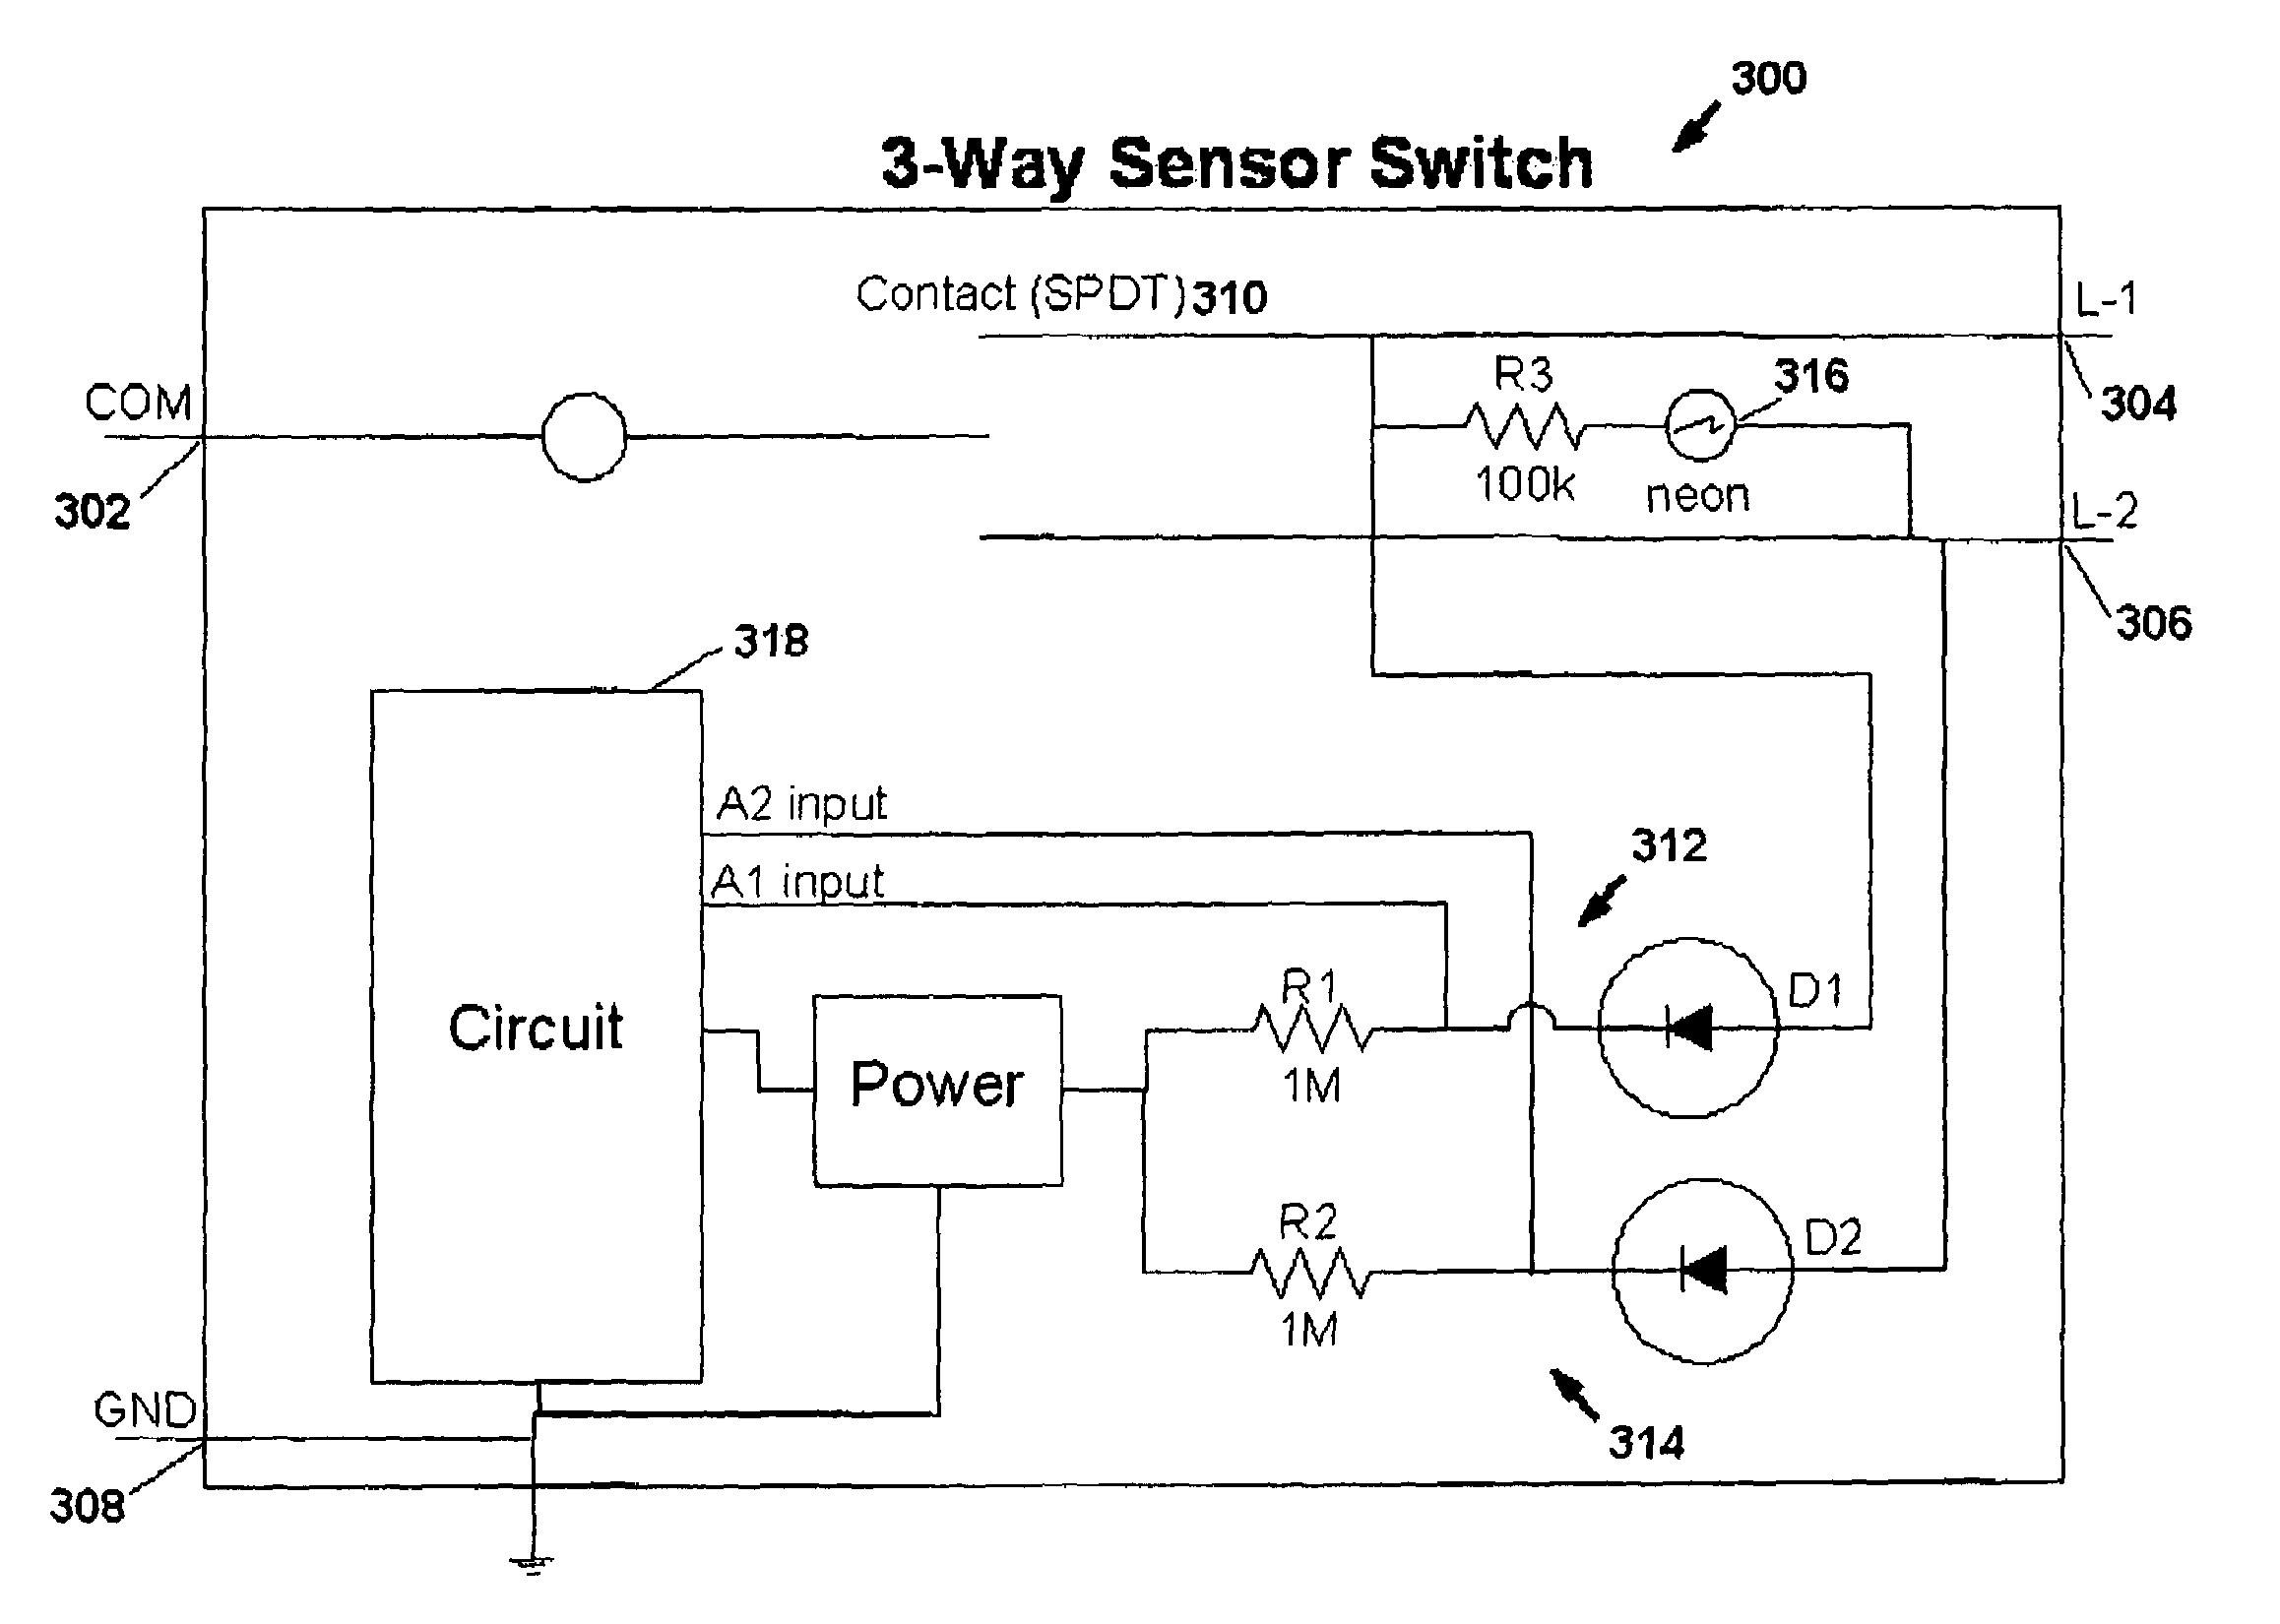 Lutron 3 Way Dimmer Wiring Diagram Inspirational Wiring Diagram Lutron Dimmer Way Wire Diagram Wiring Maestro Ma